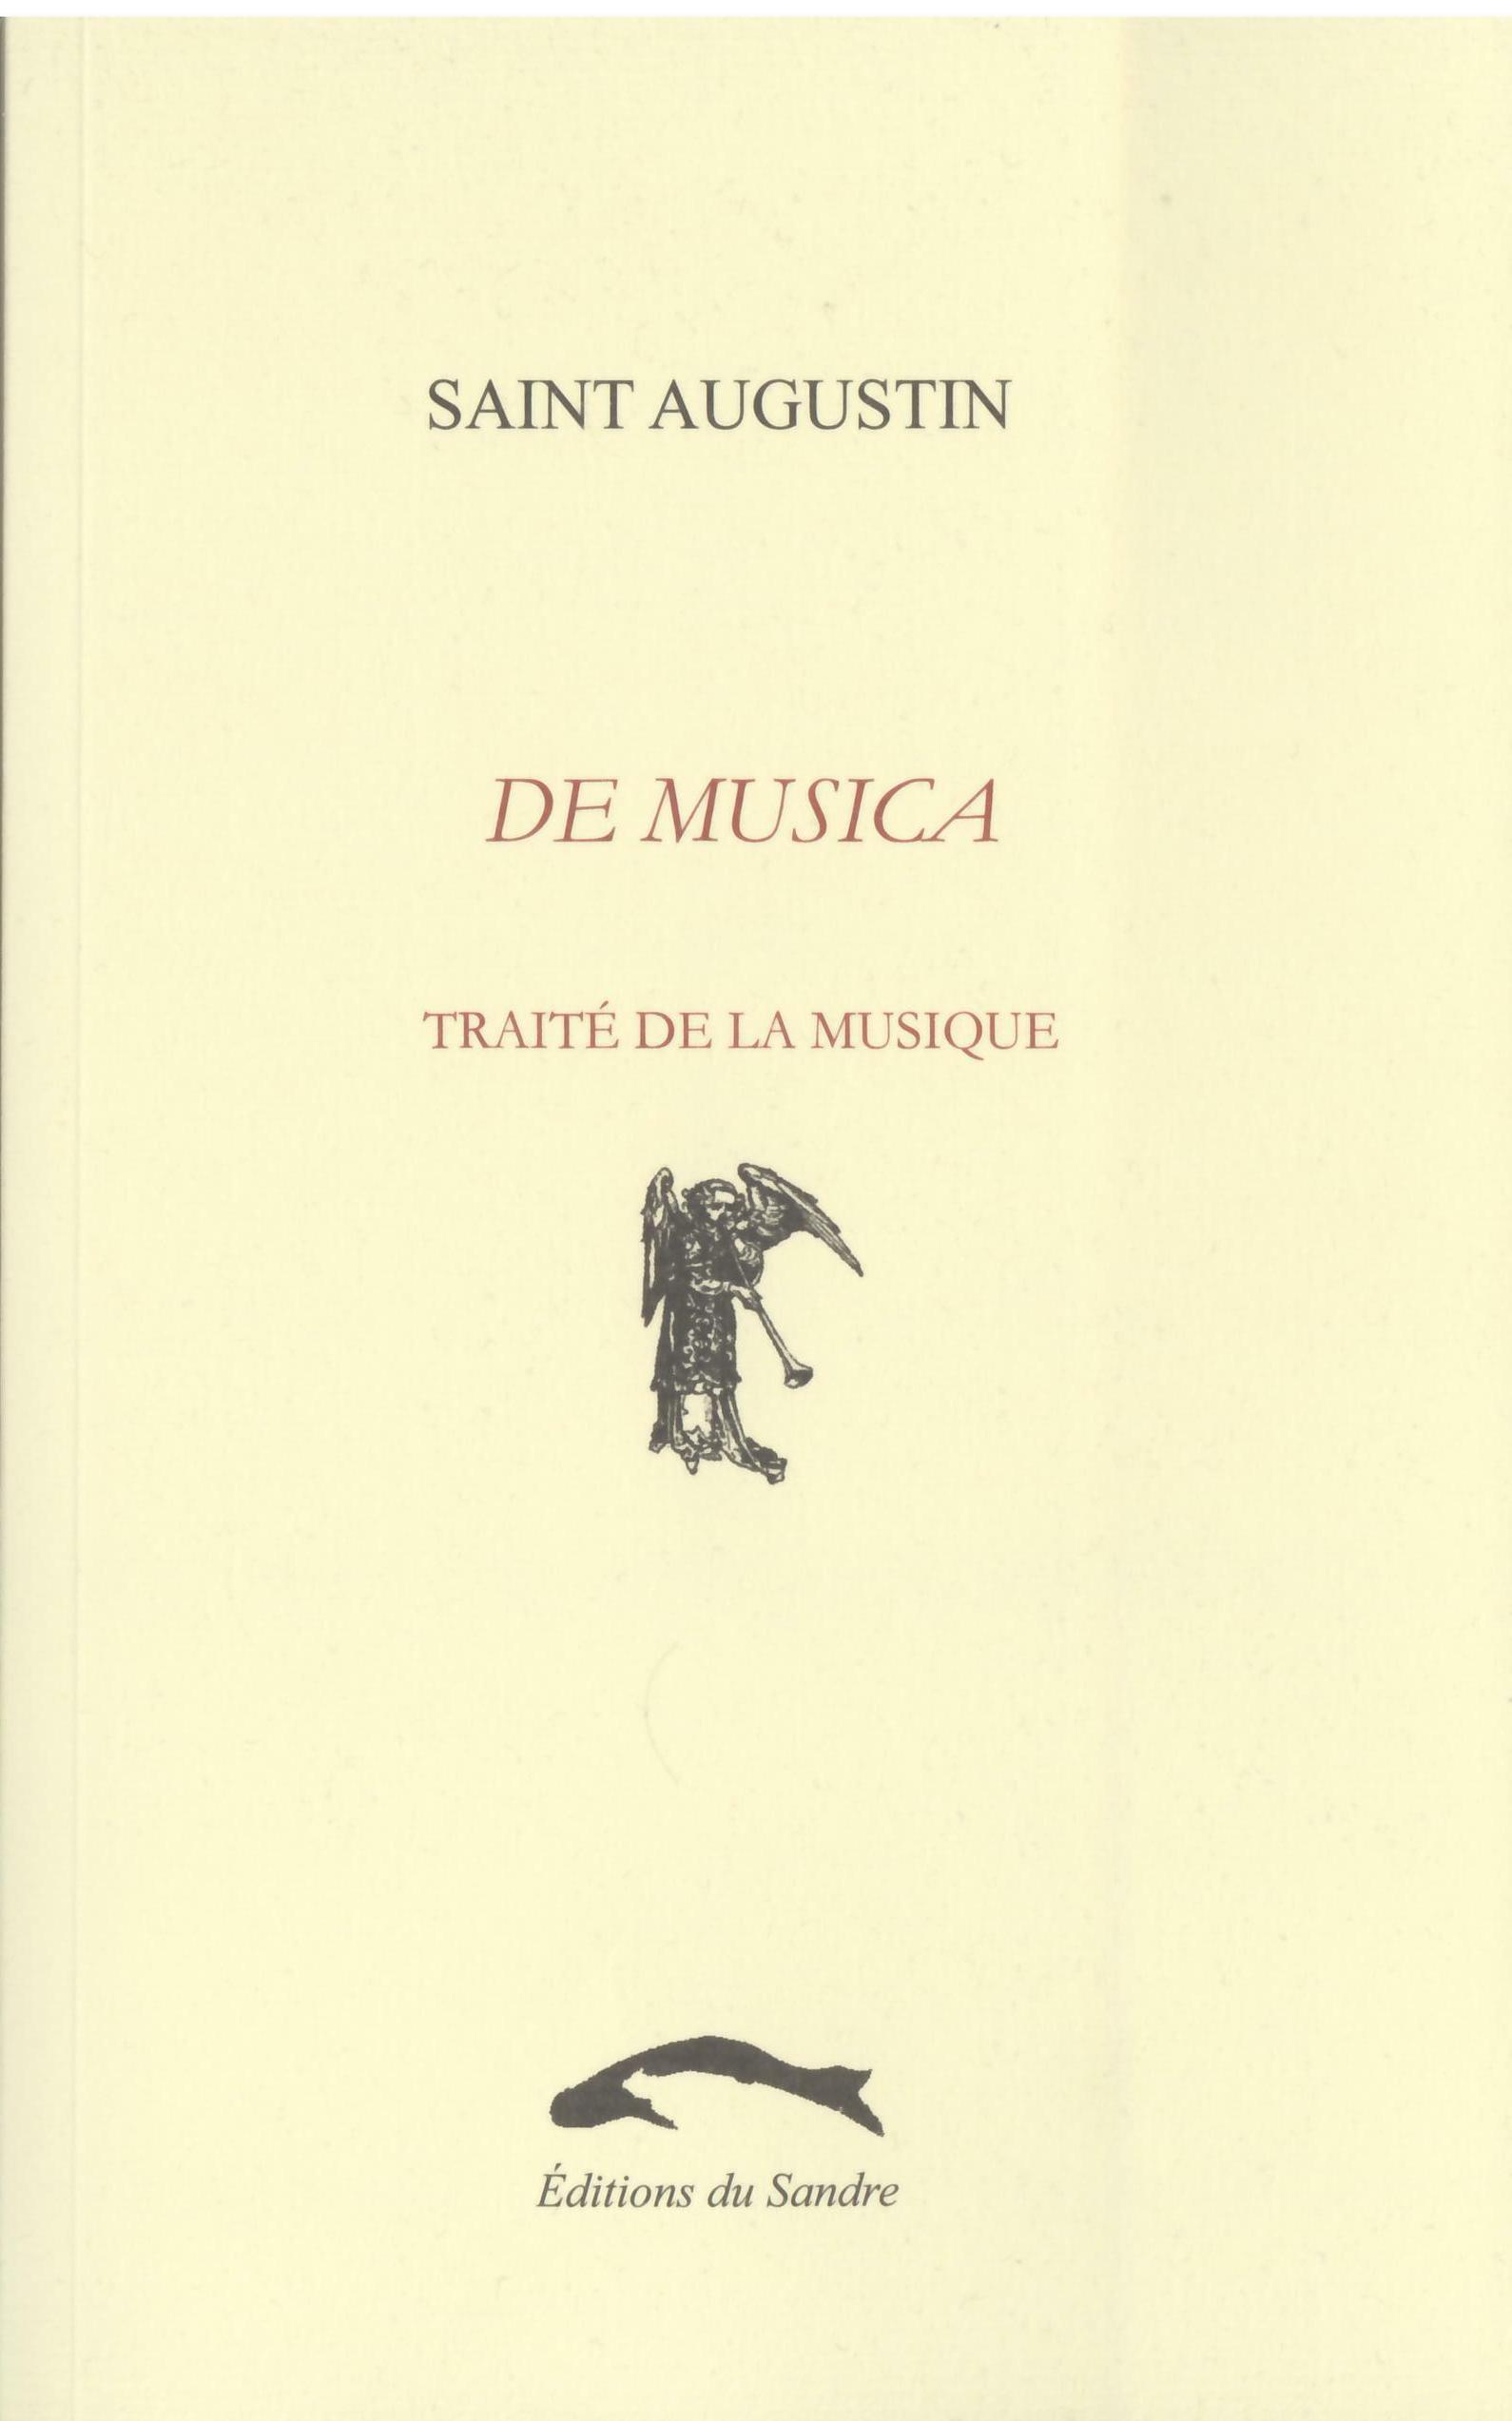 DE MUSICA - TRAITE DE LA MUSIQUE